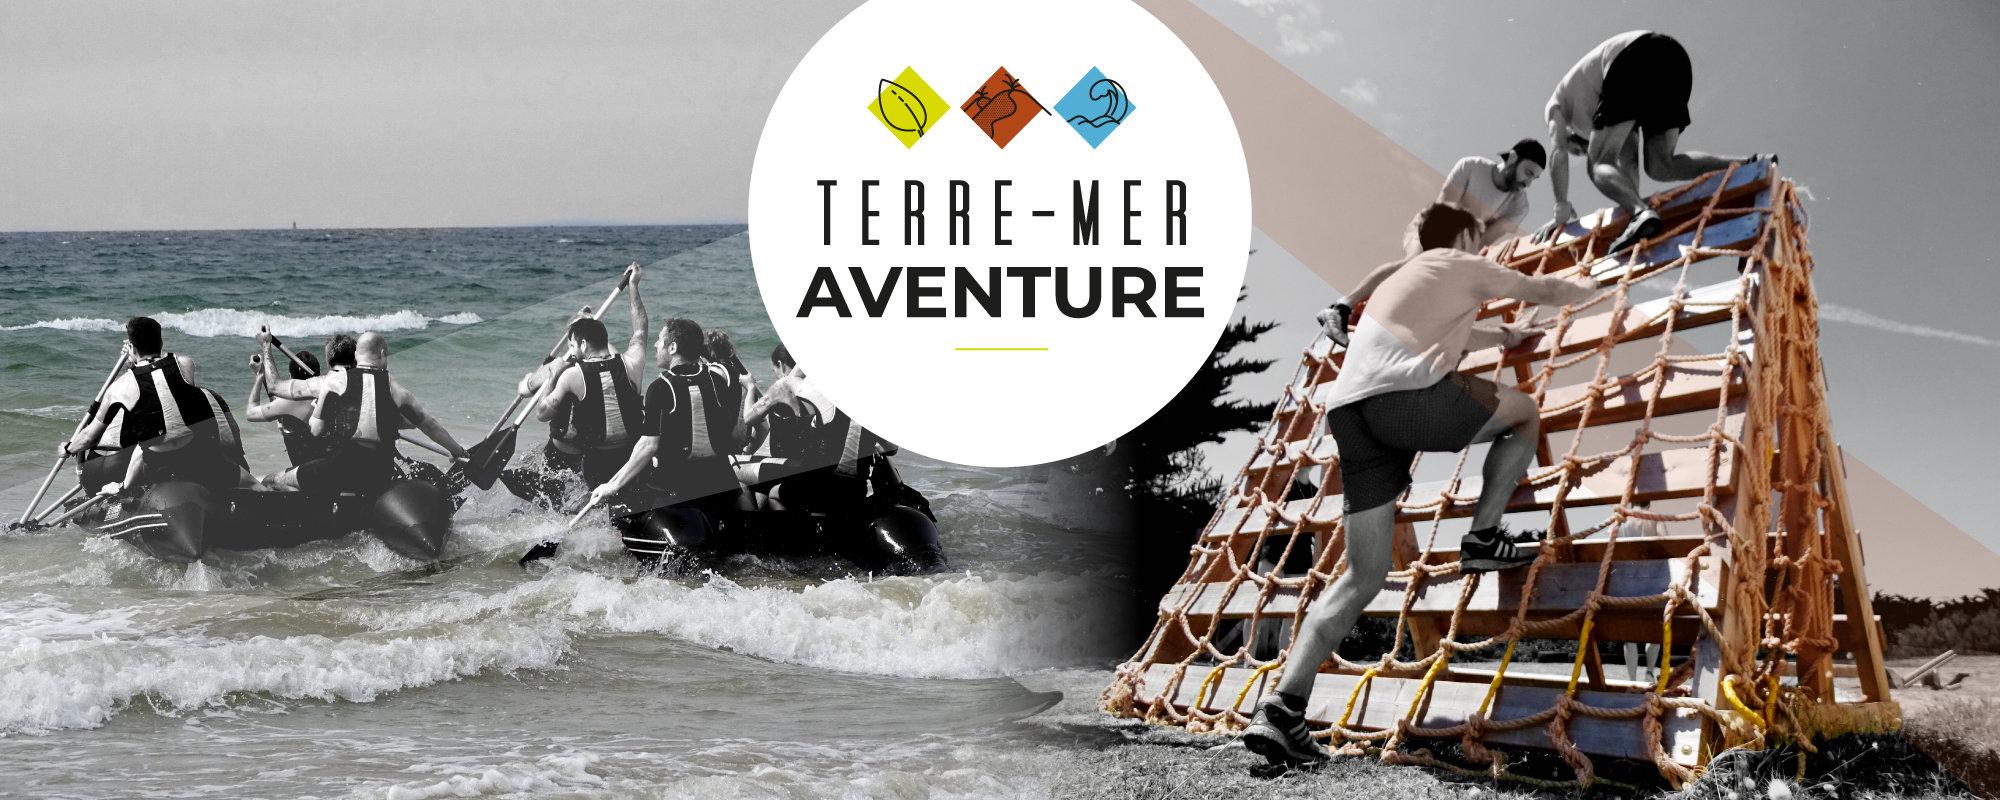 TERREMERAVENTURE_2000x800_web